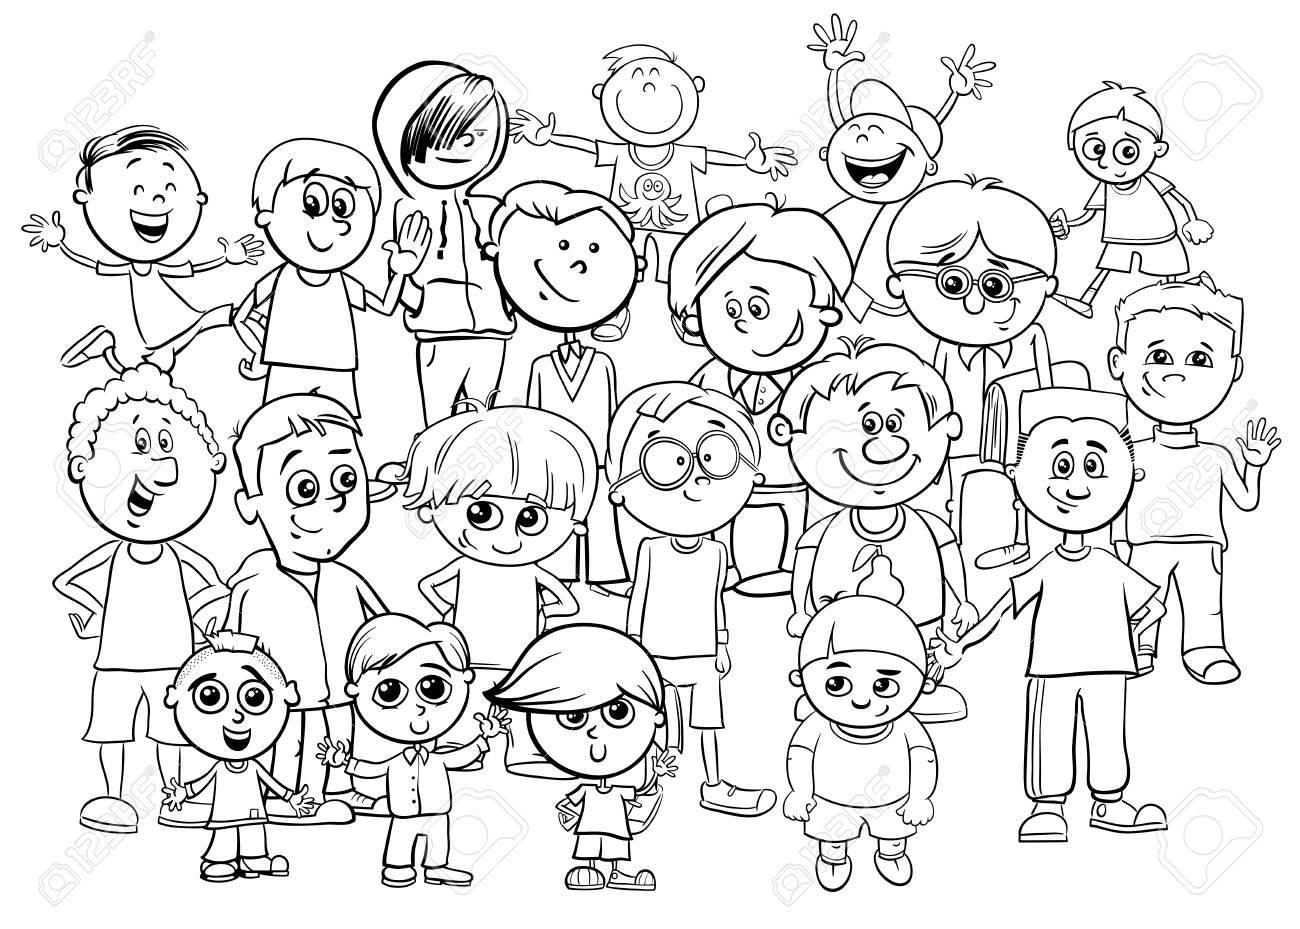 Black and White Cartoon Illustration of Elementary School Age...